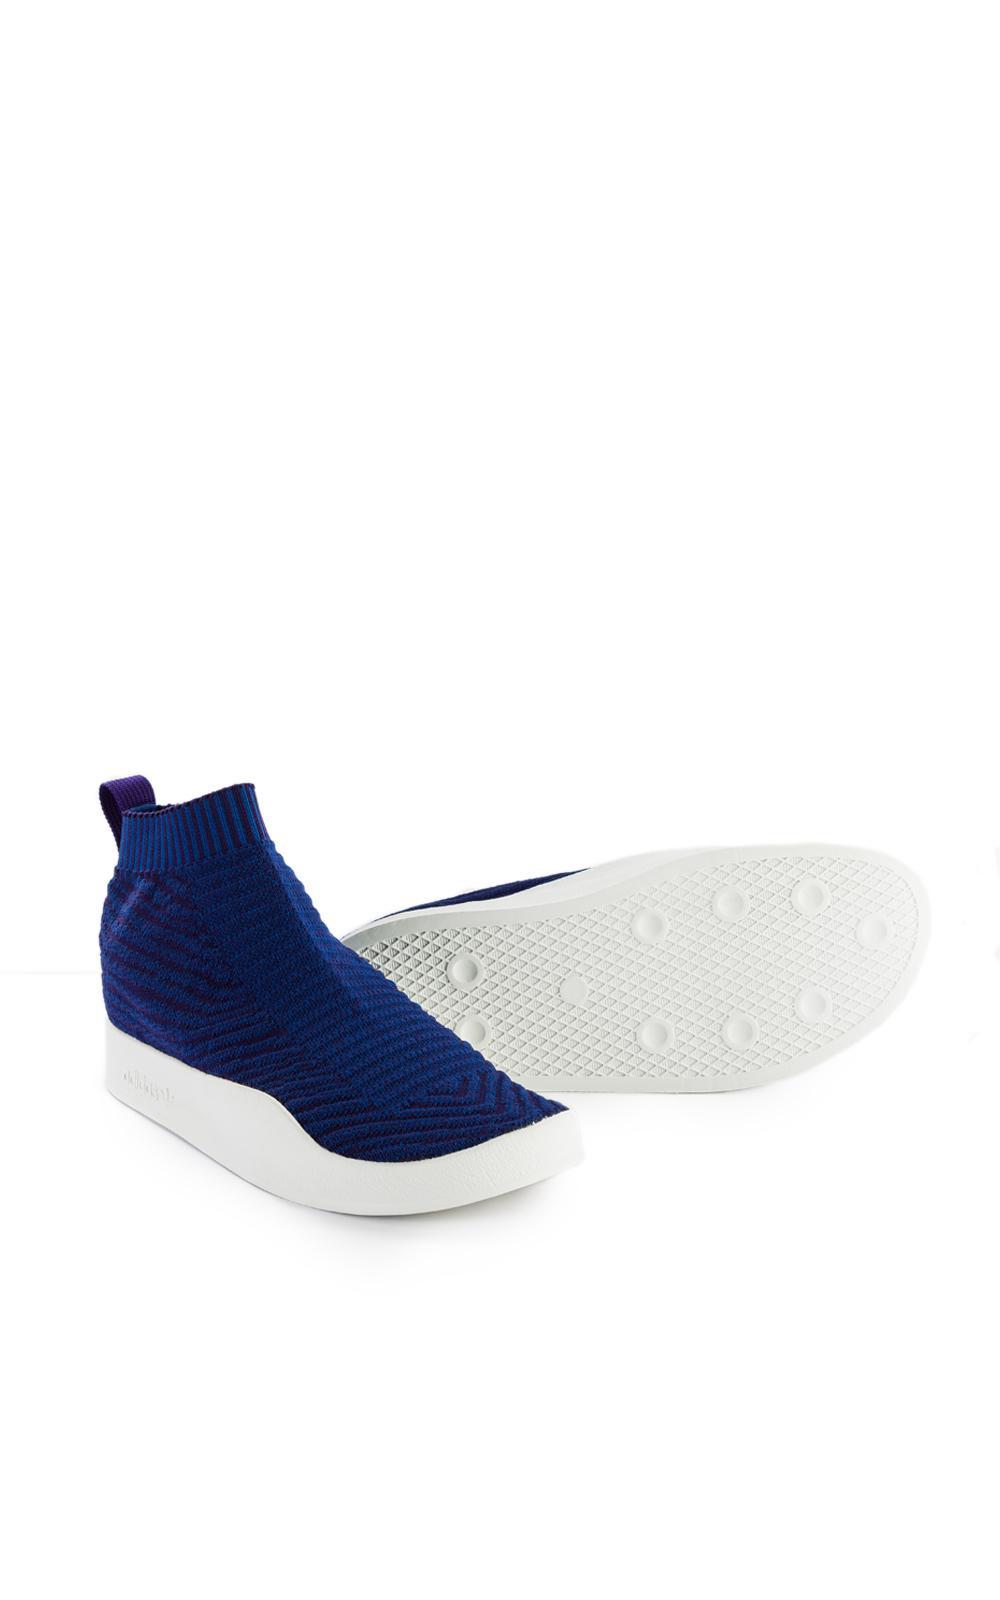 Adidas Originals Adilette Pk Sock Blue for men